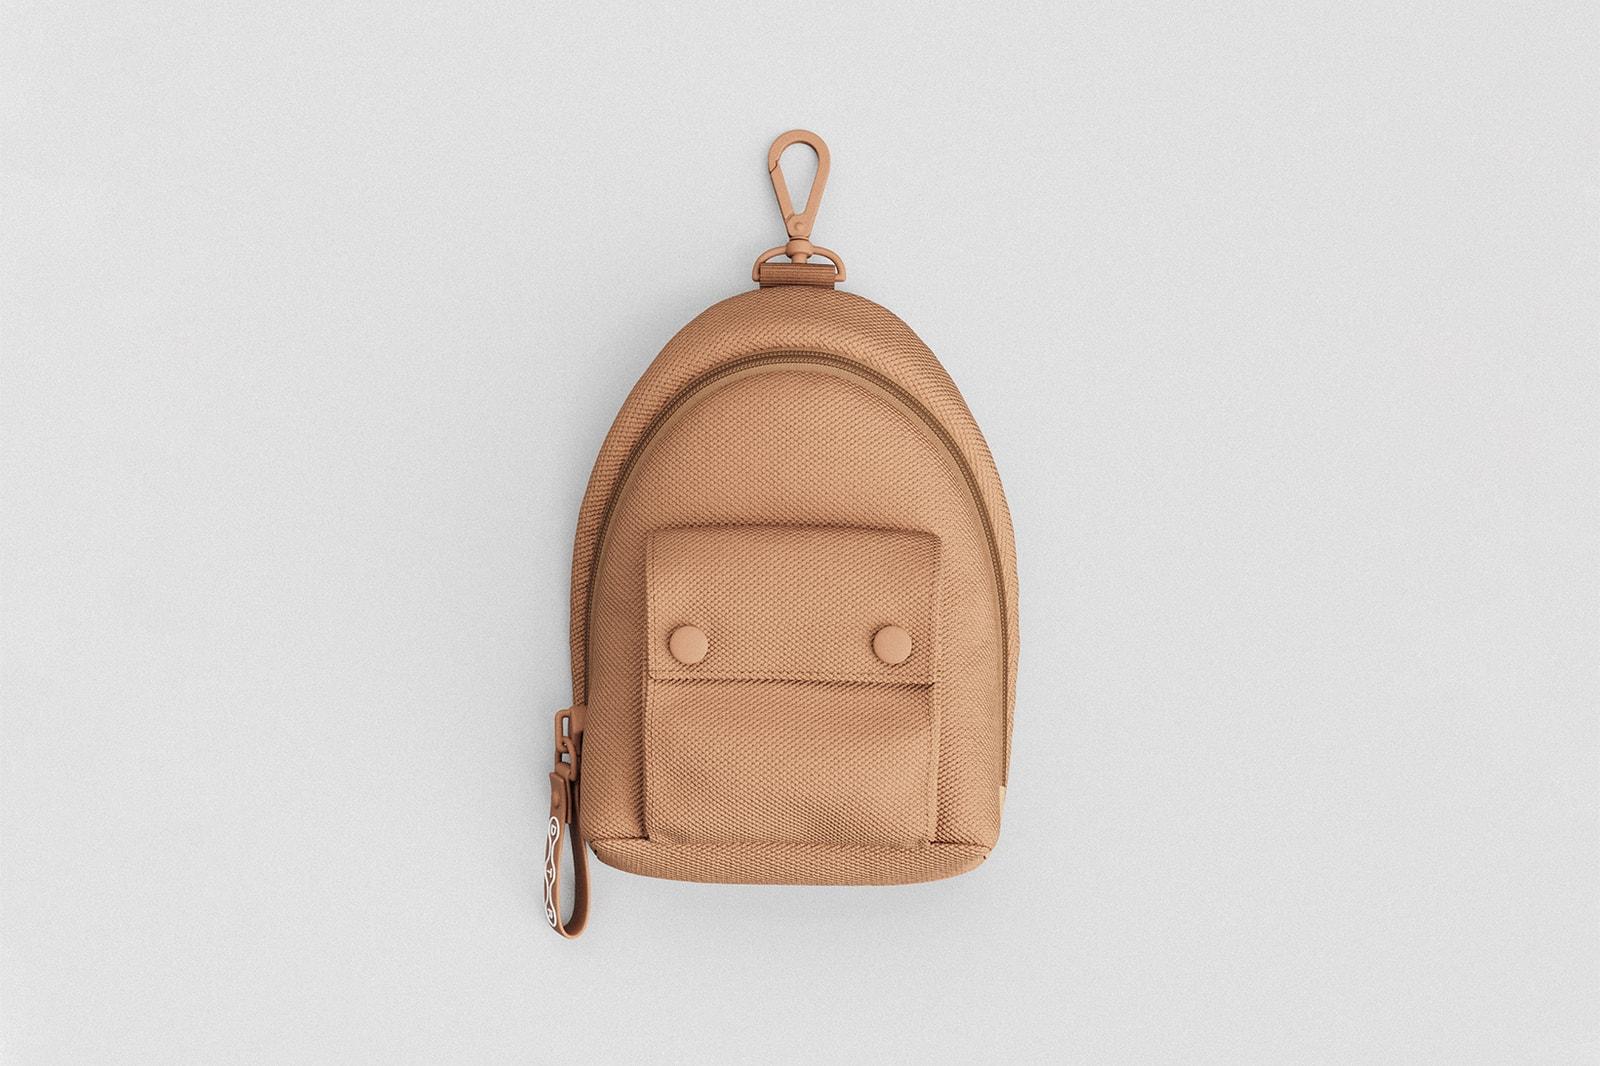 Ciara Dare To Roam Brand Bags Backpack